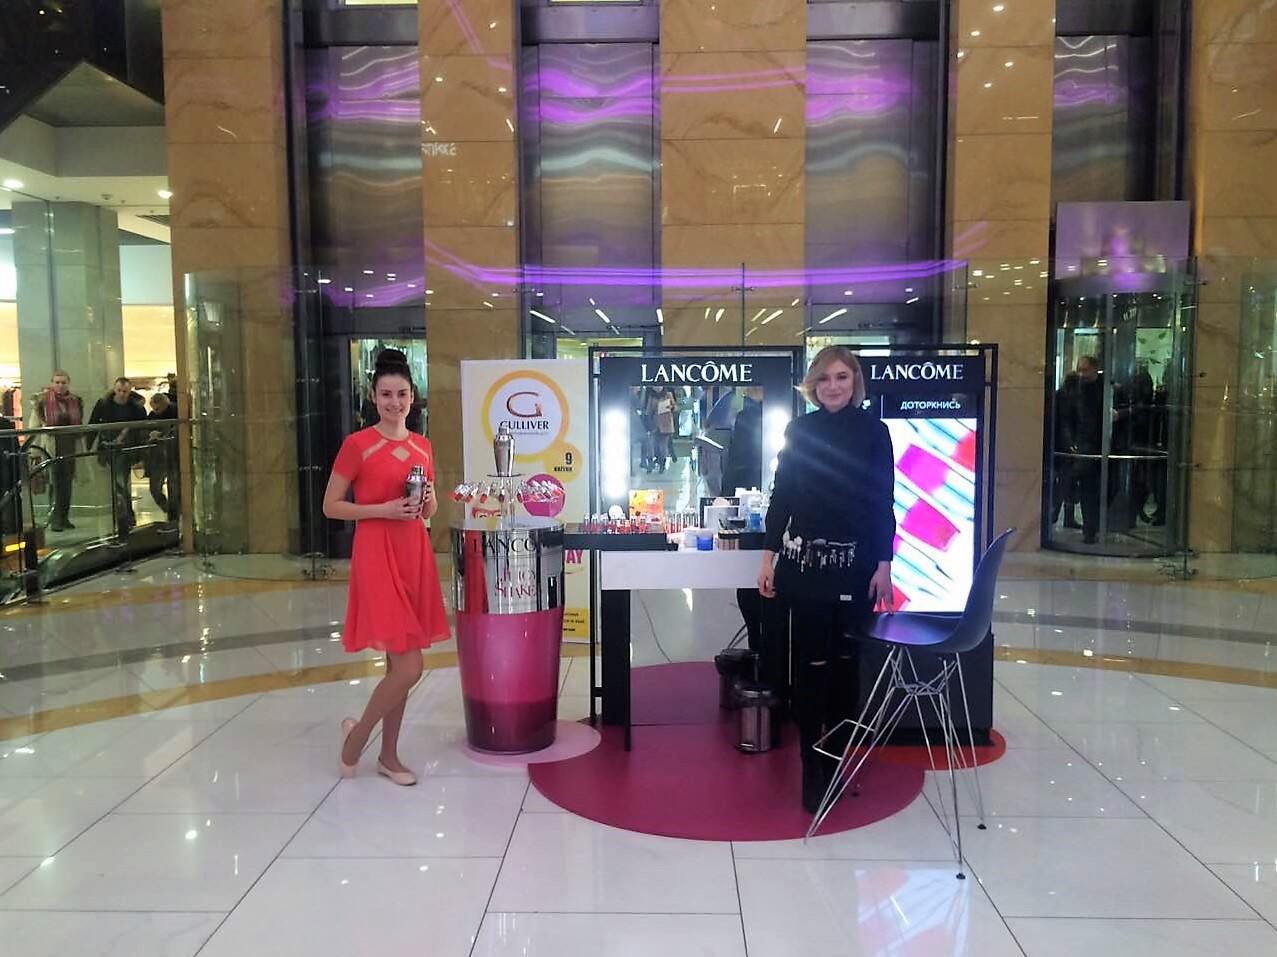 Презентация нового продукта от Lancôme – кушн для губ Juicy Shaker